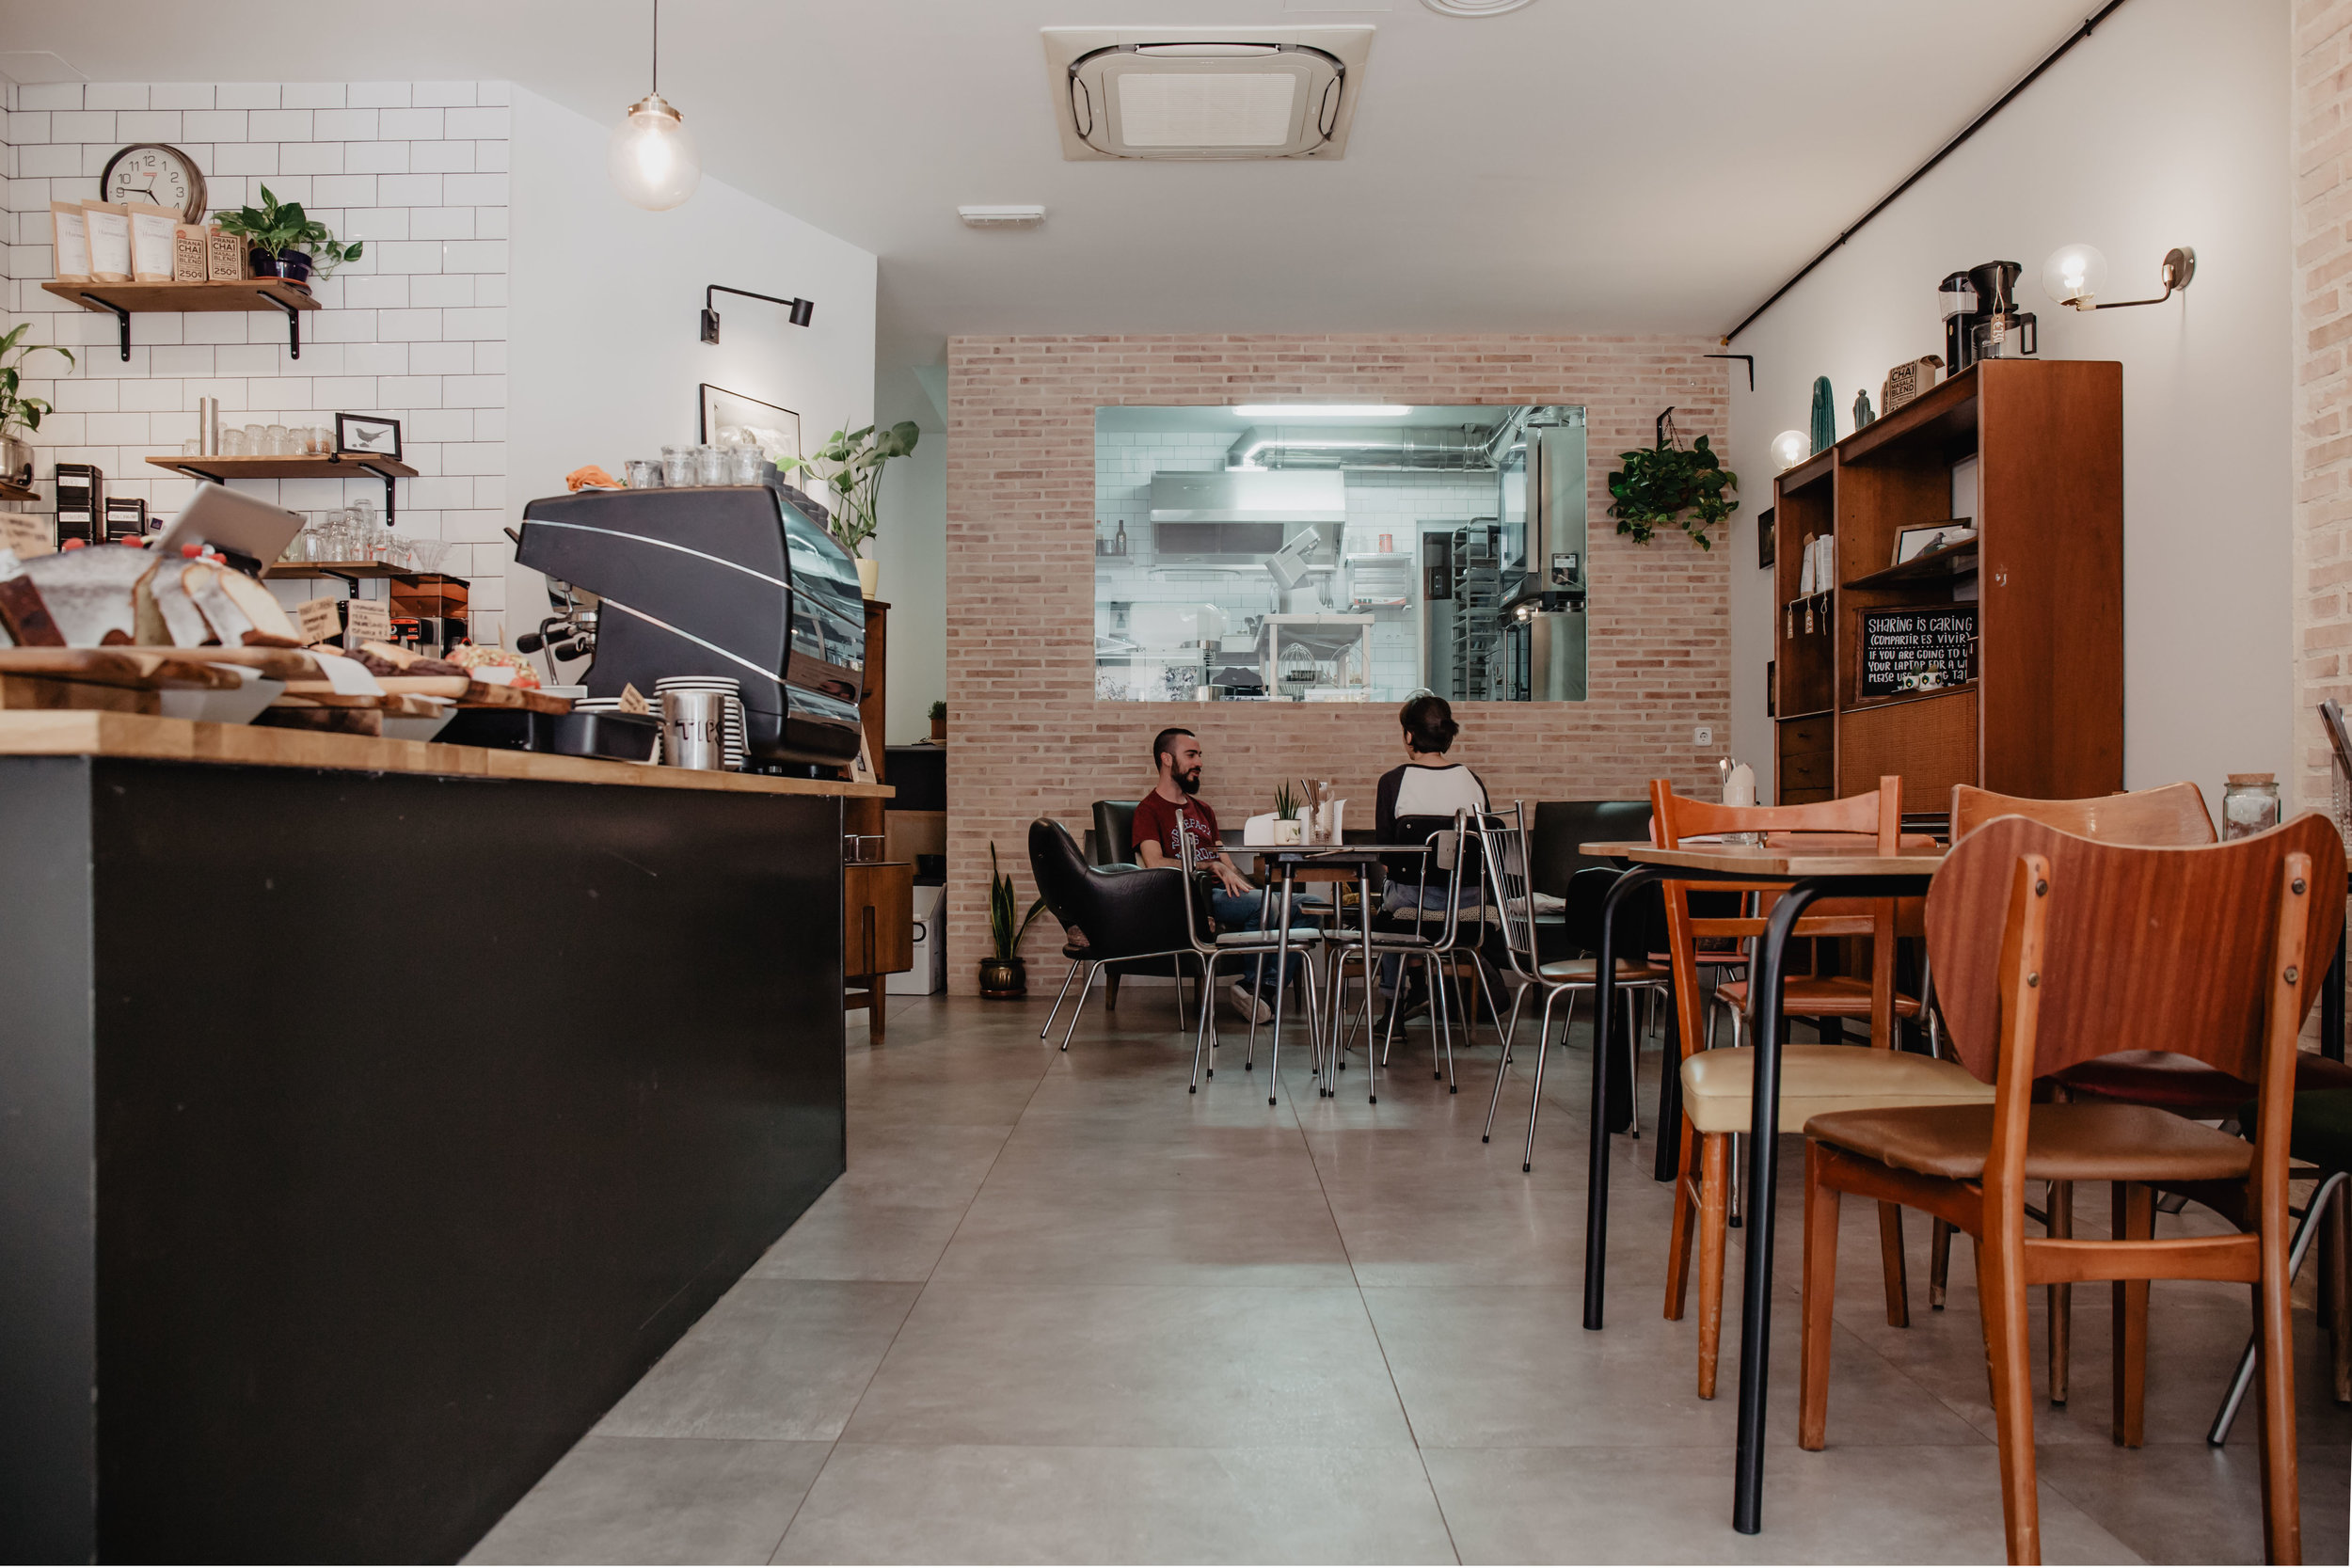 blackbird speiclaty coffee shop valencia